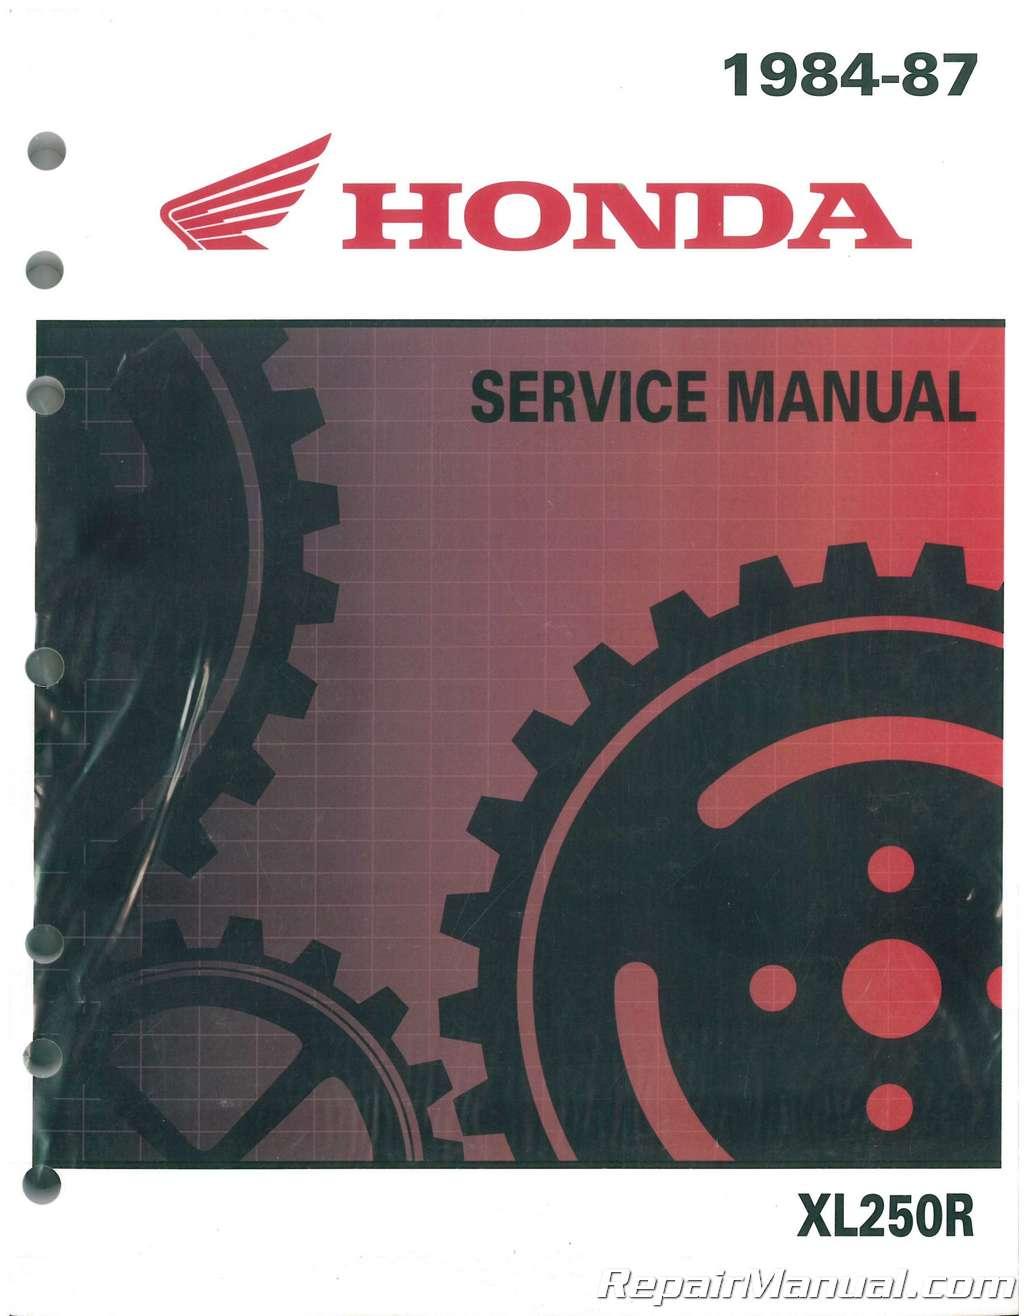 1984 1987 honda xl250r motorcycle service manual rh repairmanual com 1987 honda xl250 service manual pdf 1972 Honda XL250